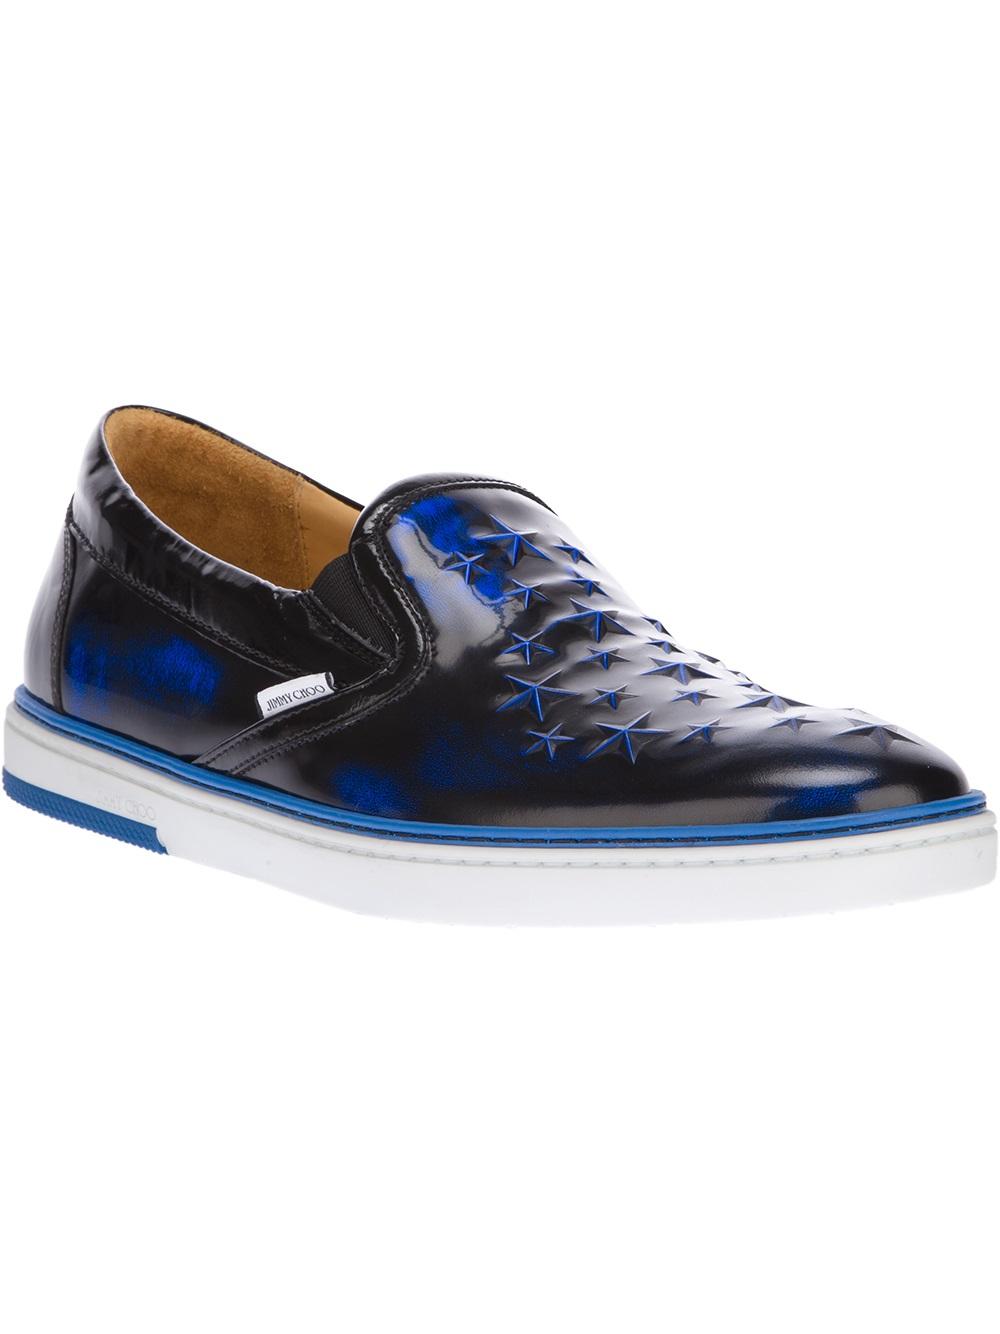 jimmy choo groove slip on sneaker in blue for men lyst. Black Bedroom Furniture Sets. Home Design Ideas